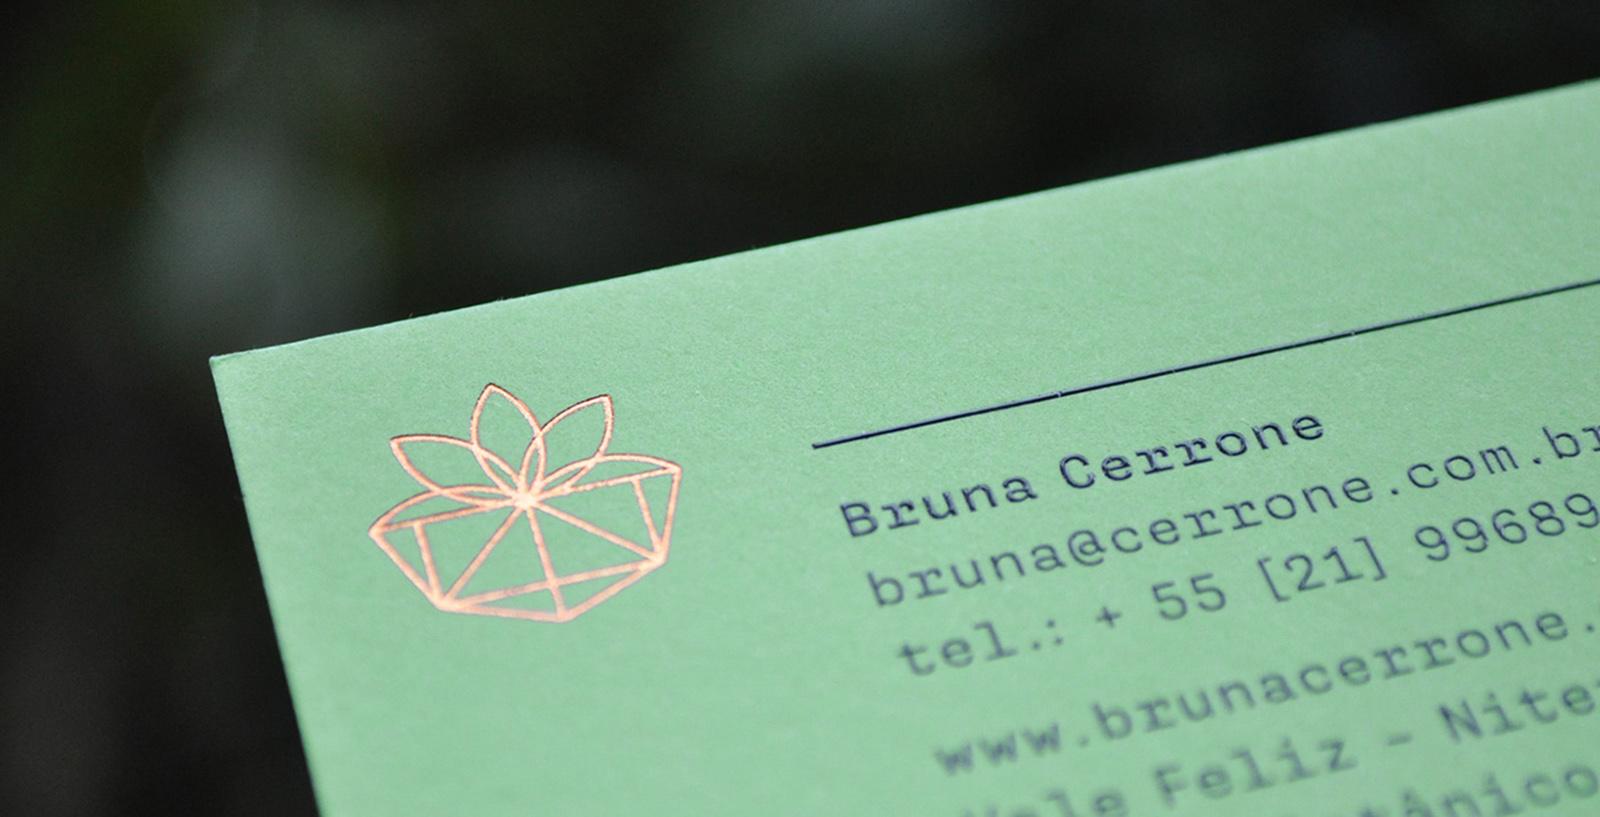 Oficina Botânica 品牌视觉VI设计欣赏-深圳VI设计8